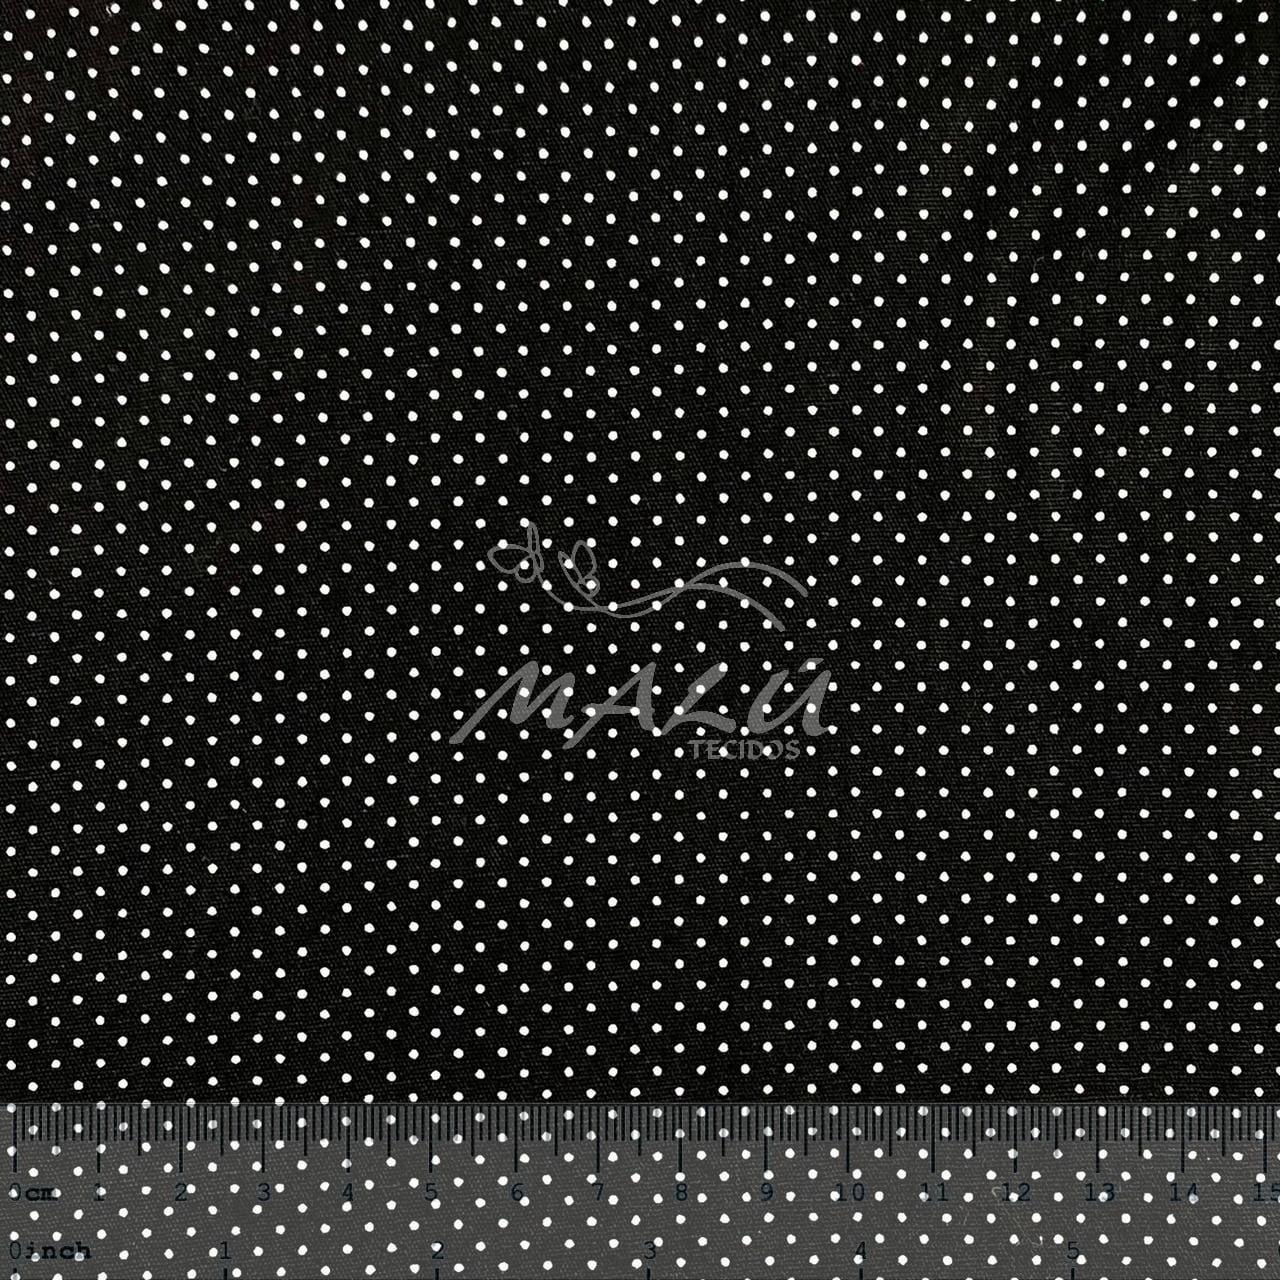 Tricoline Poazinho Preto com Branco